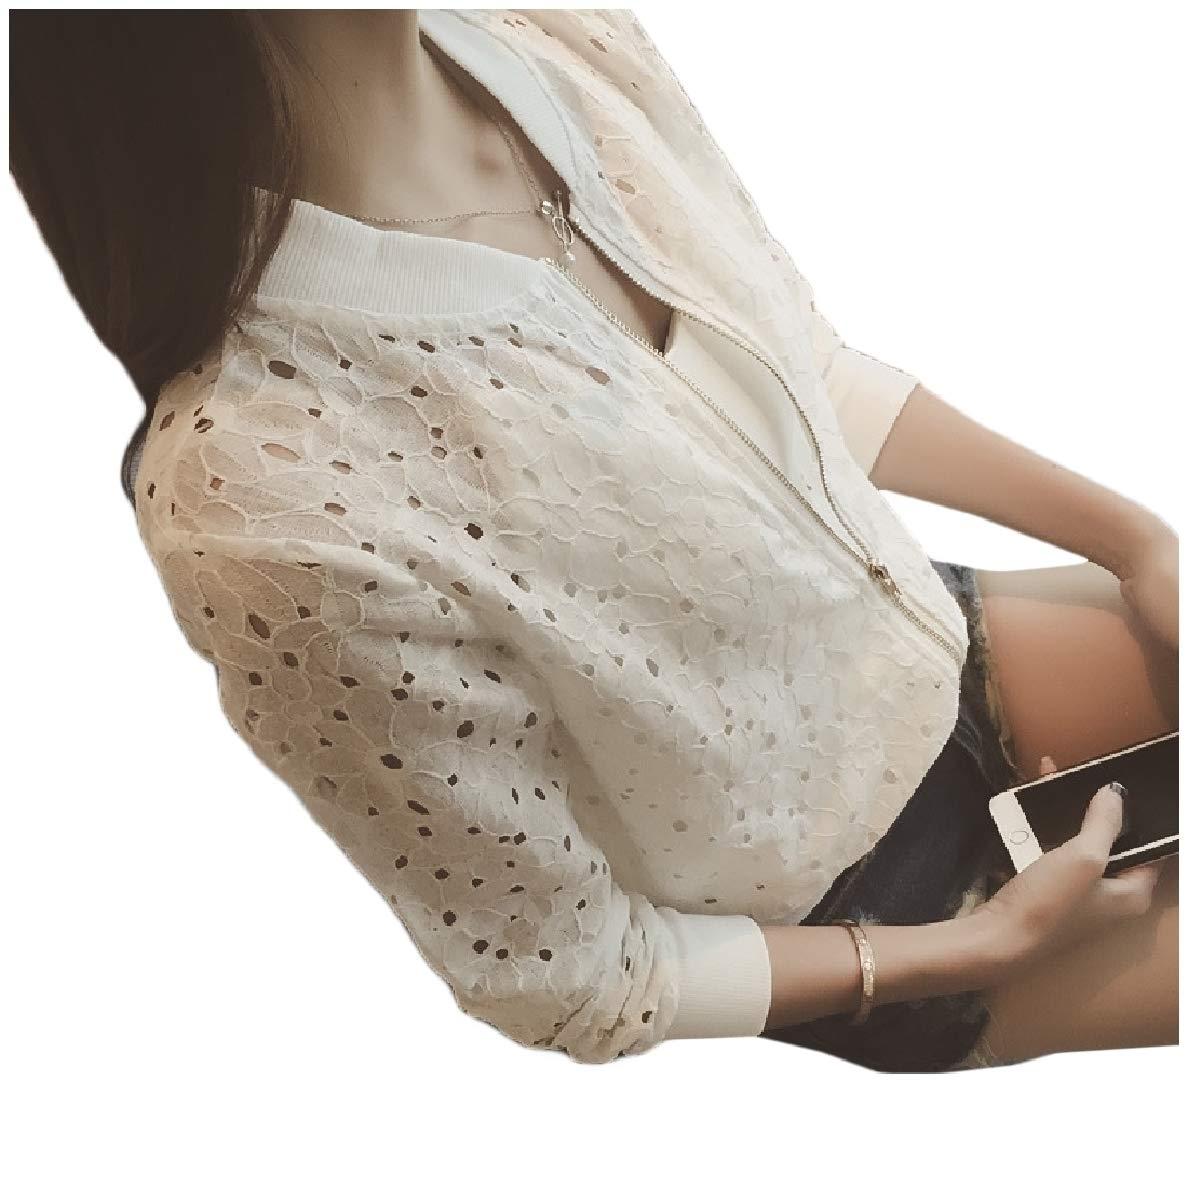 willwinWomen WillingStart Womens Hollow Out Long-Sleeve Zips Lounge Stand Collar Outwear Jacket White S